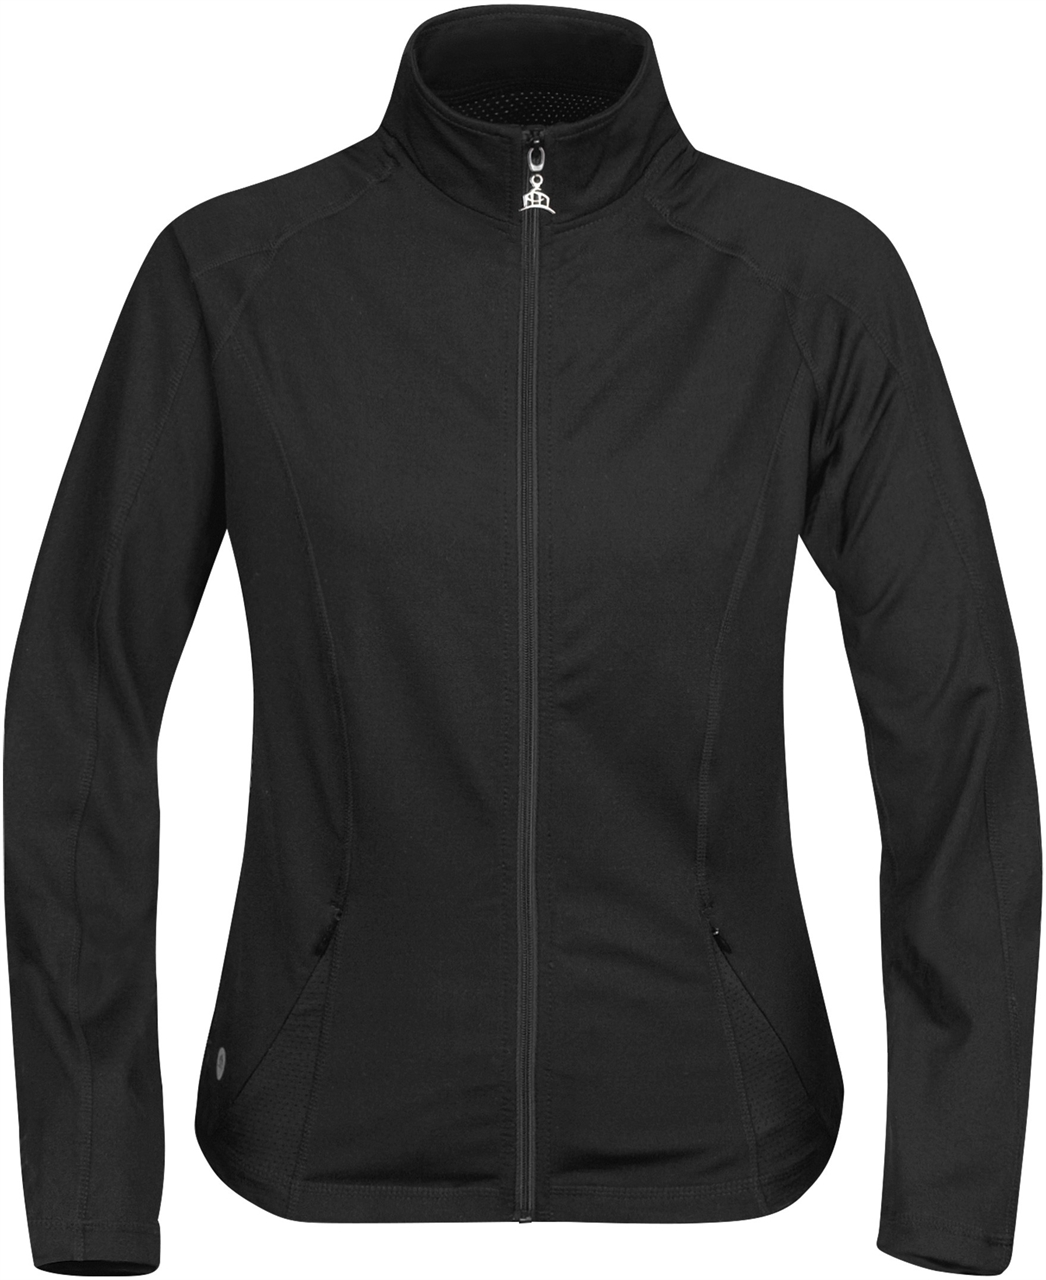 Picture of Stormtech Women's Flex Textured Jacket